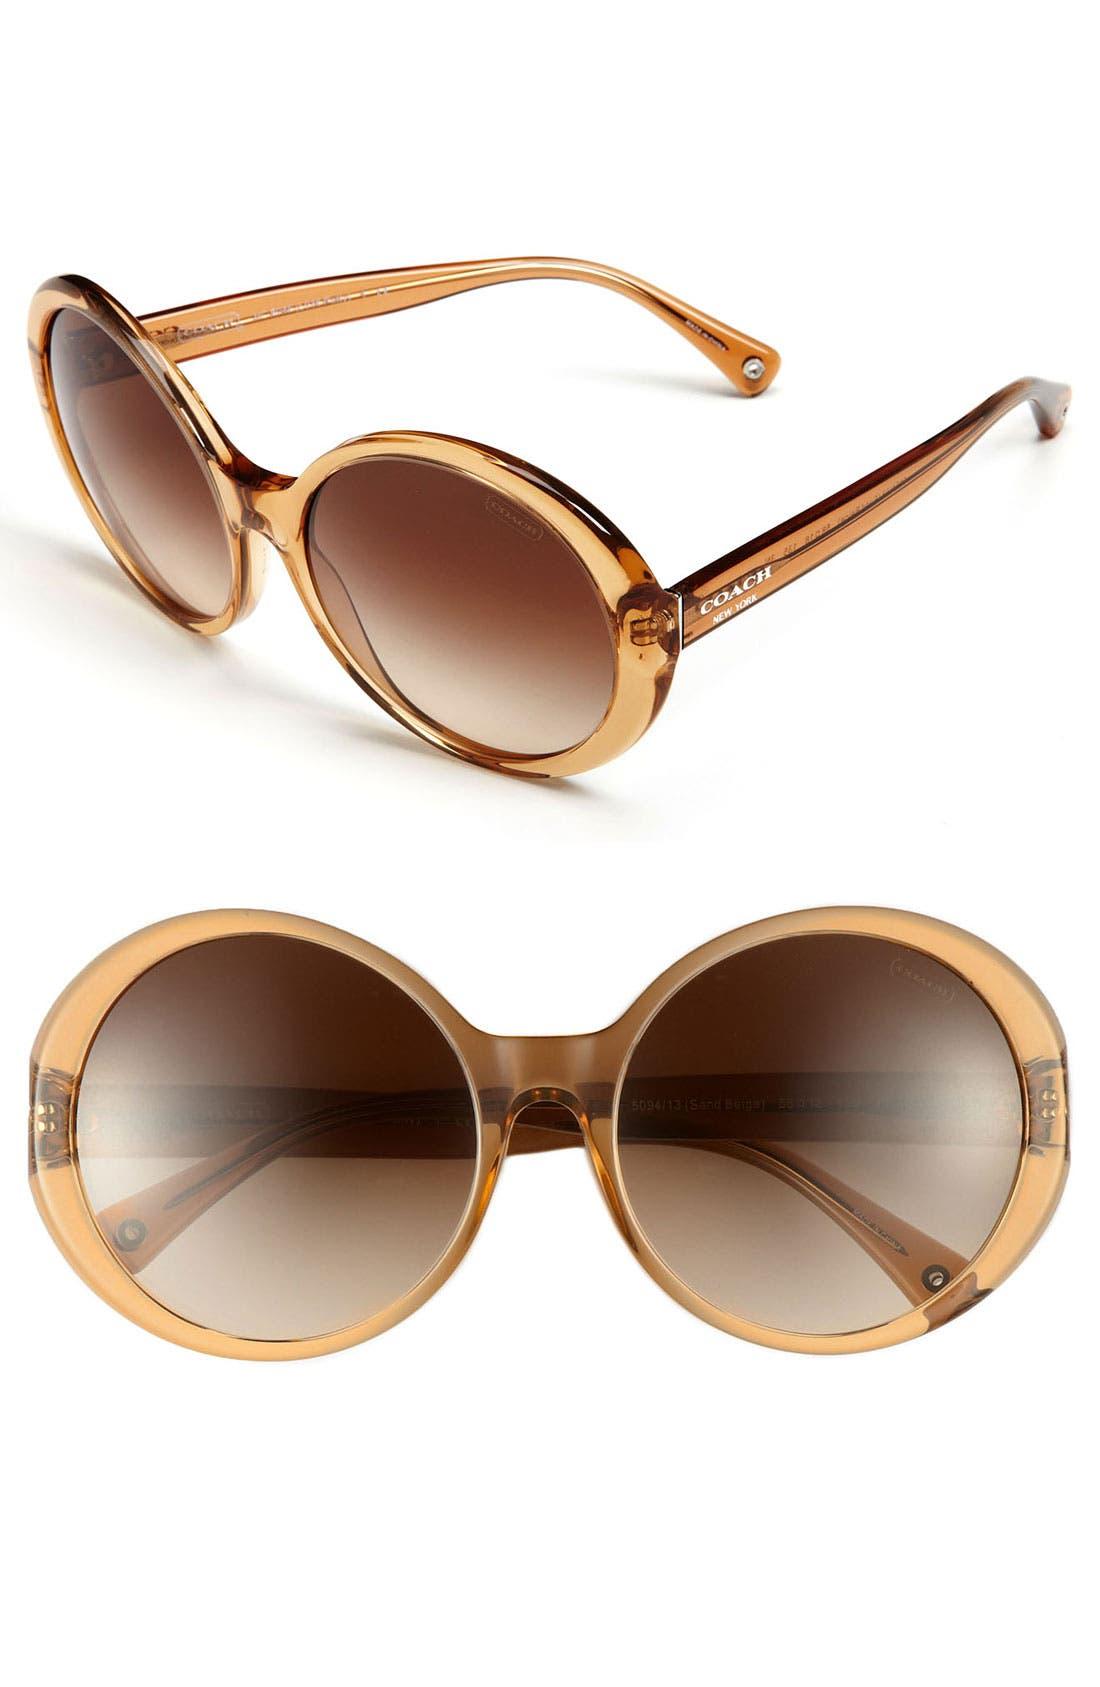 Main Image - COACH 58mm Retro Oversized Sunglasses